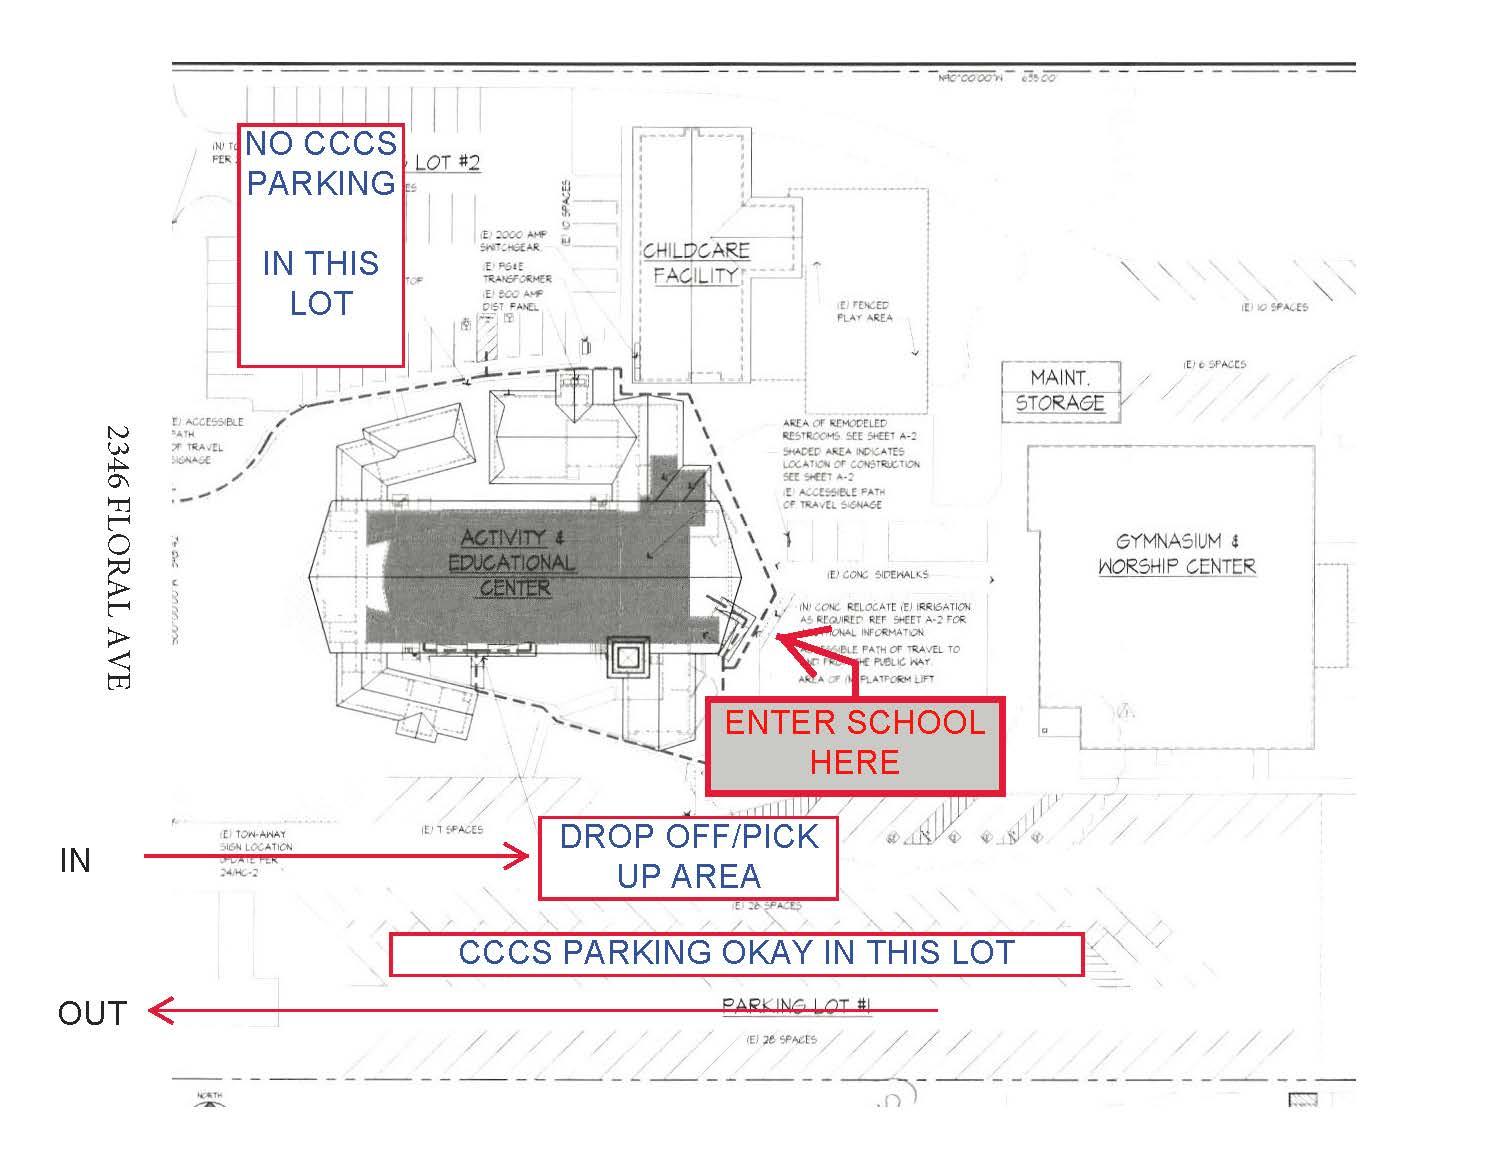 CCCS Parking Map at Grace Community Church